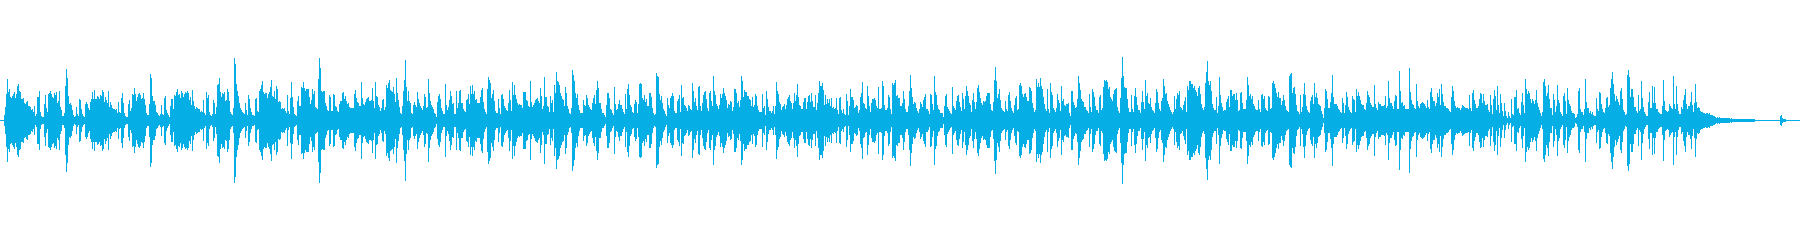 60's pops テイクアウト用BGMの再生済みの波形